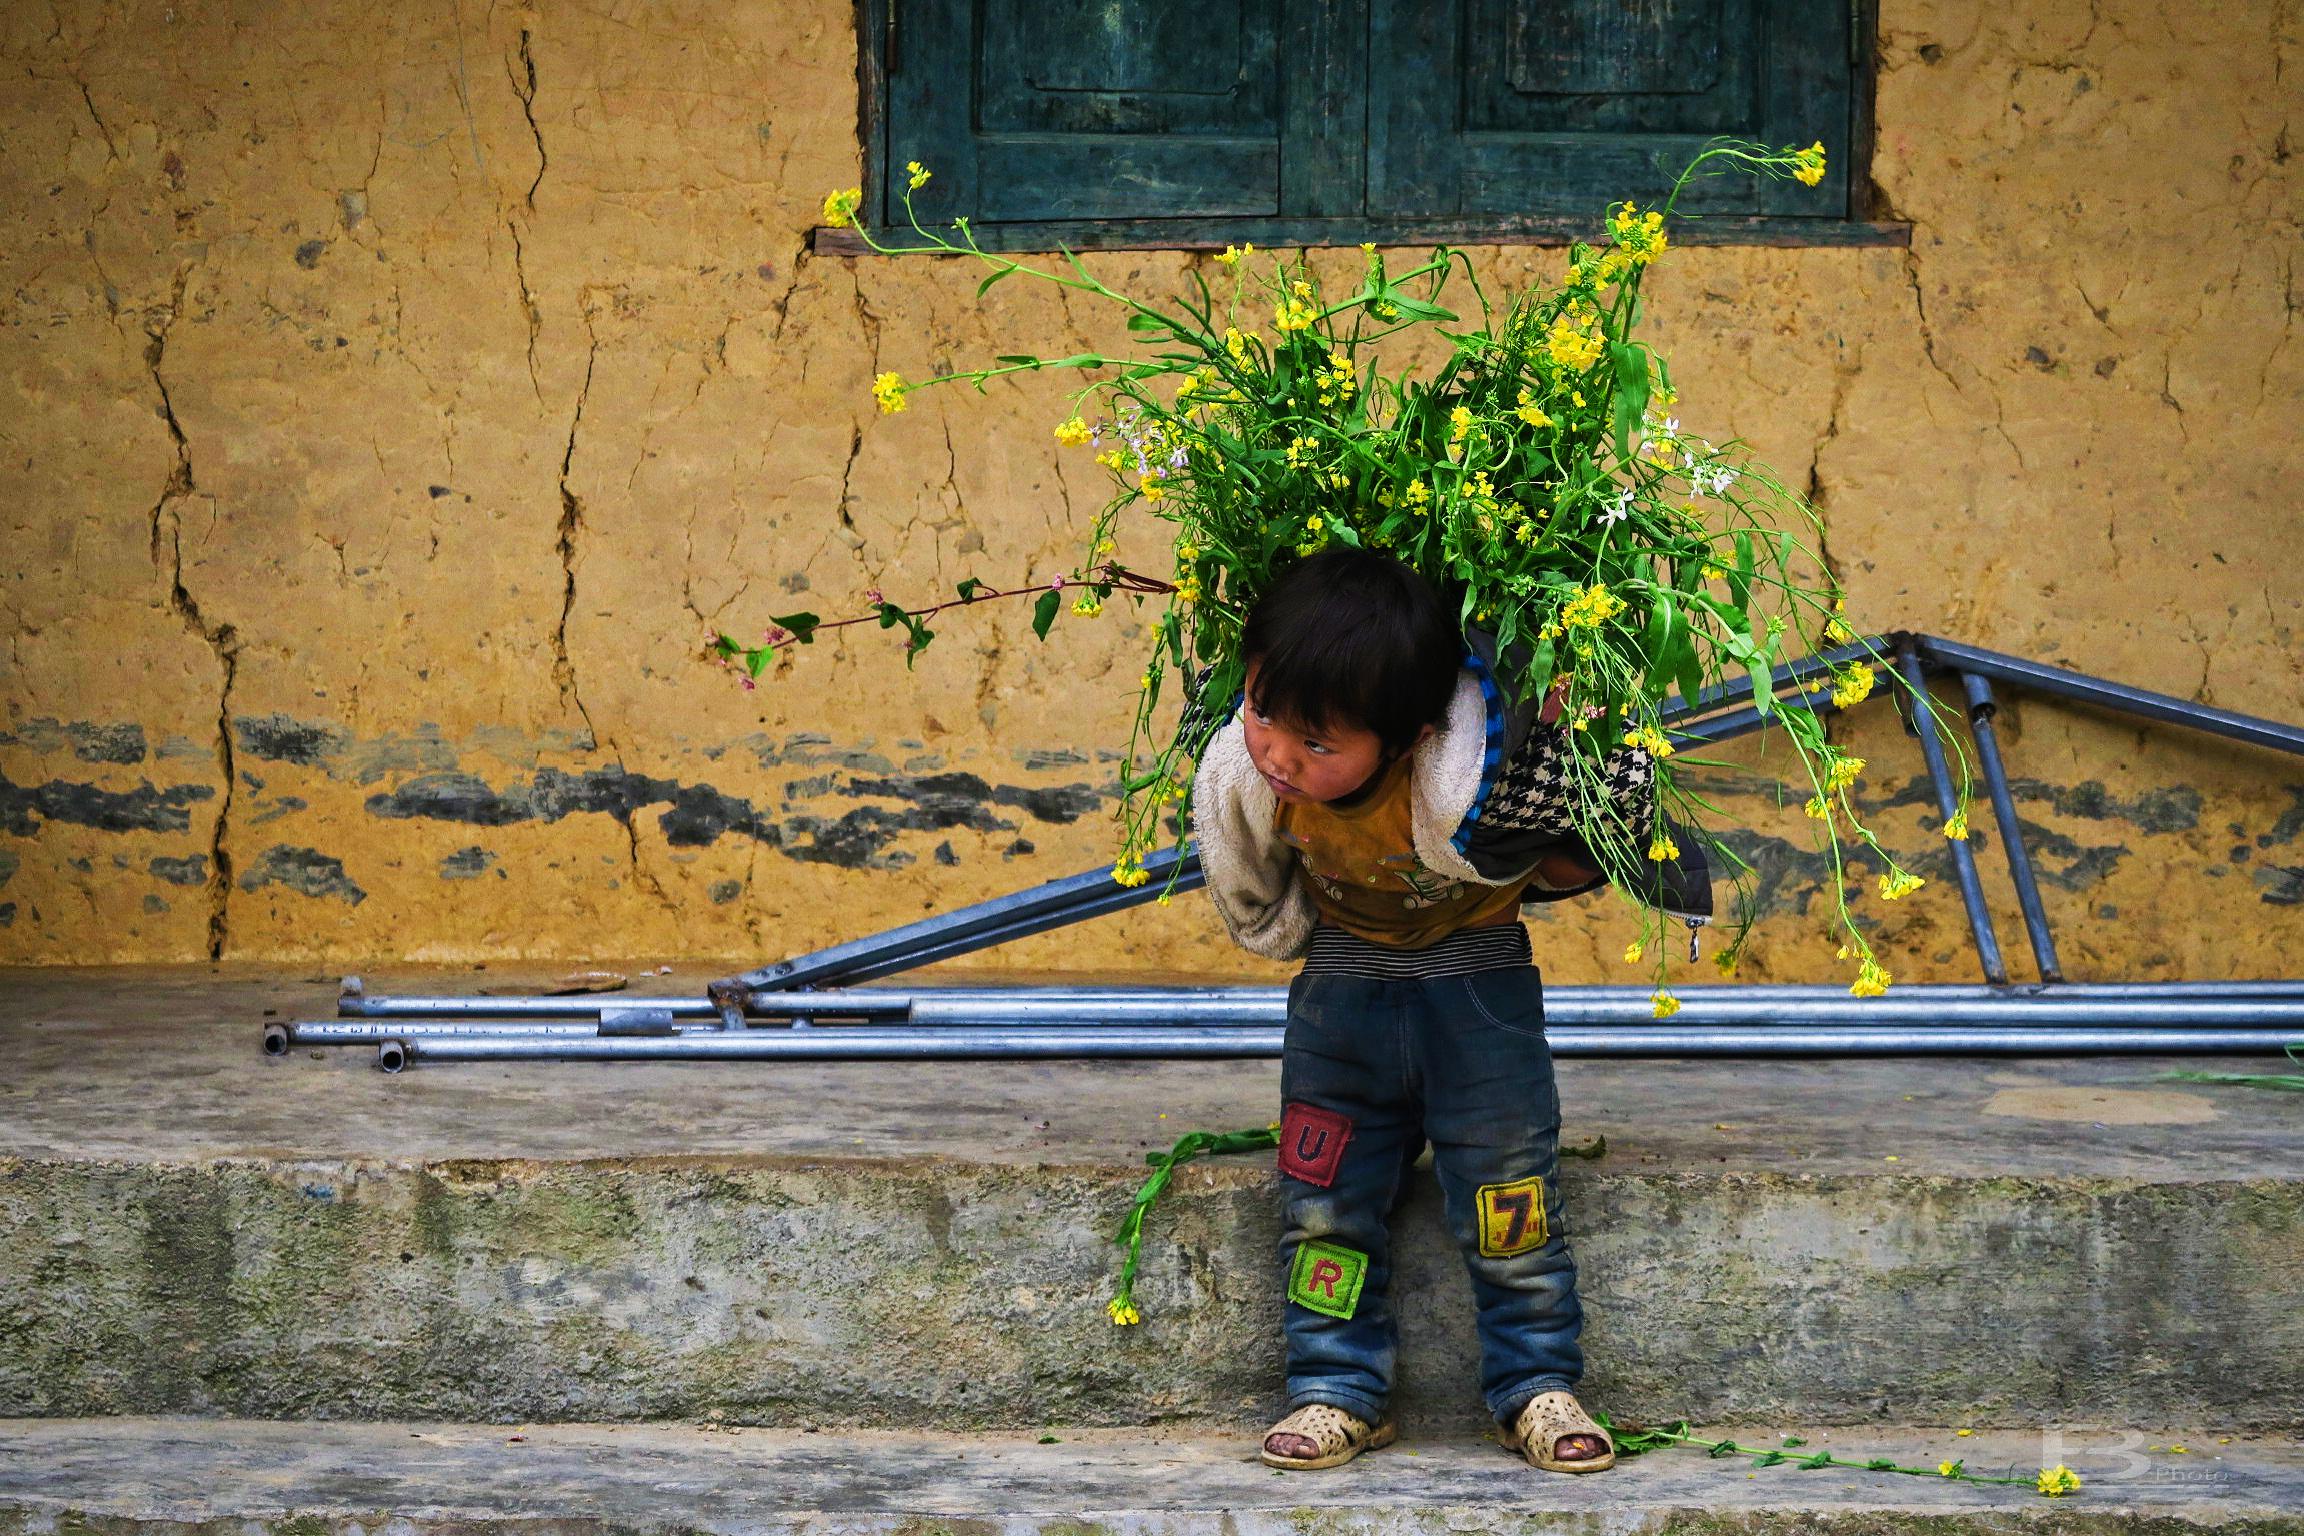 Vietnam_2017_B023_155.jpg